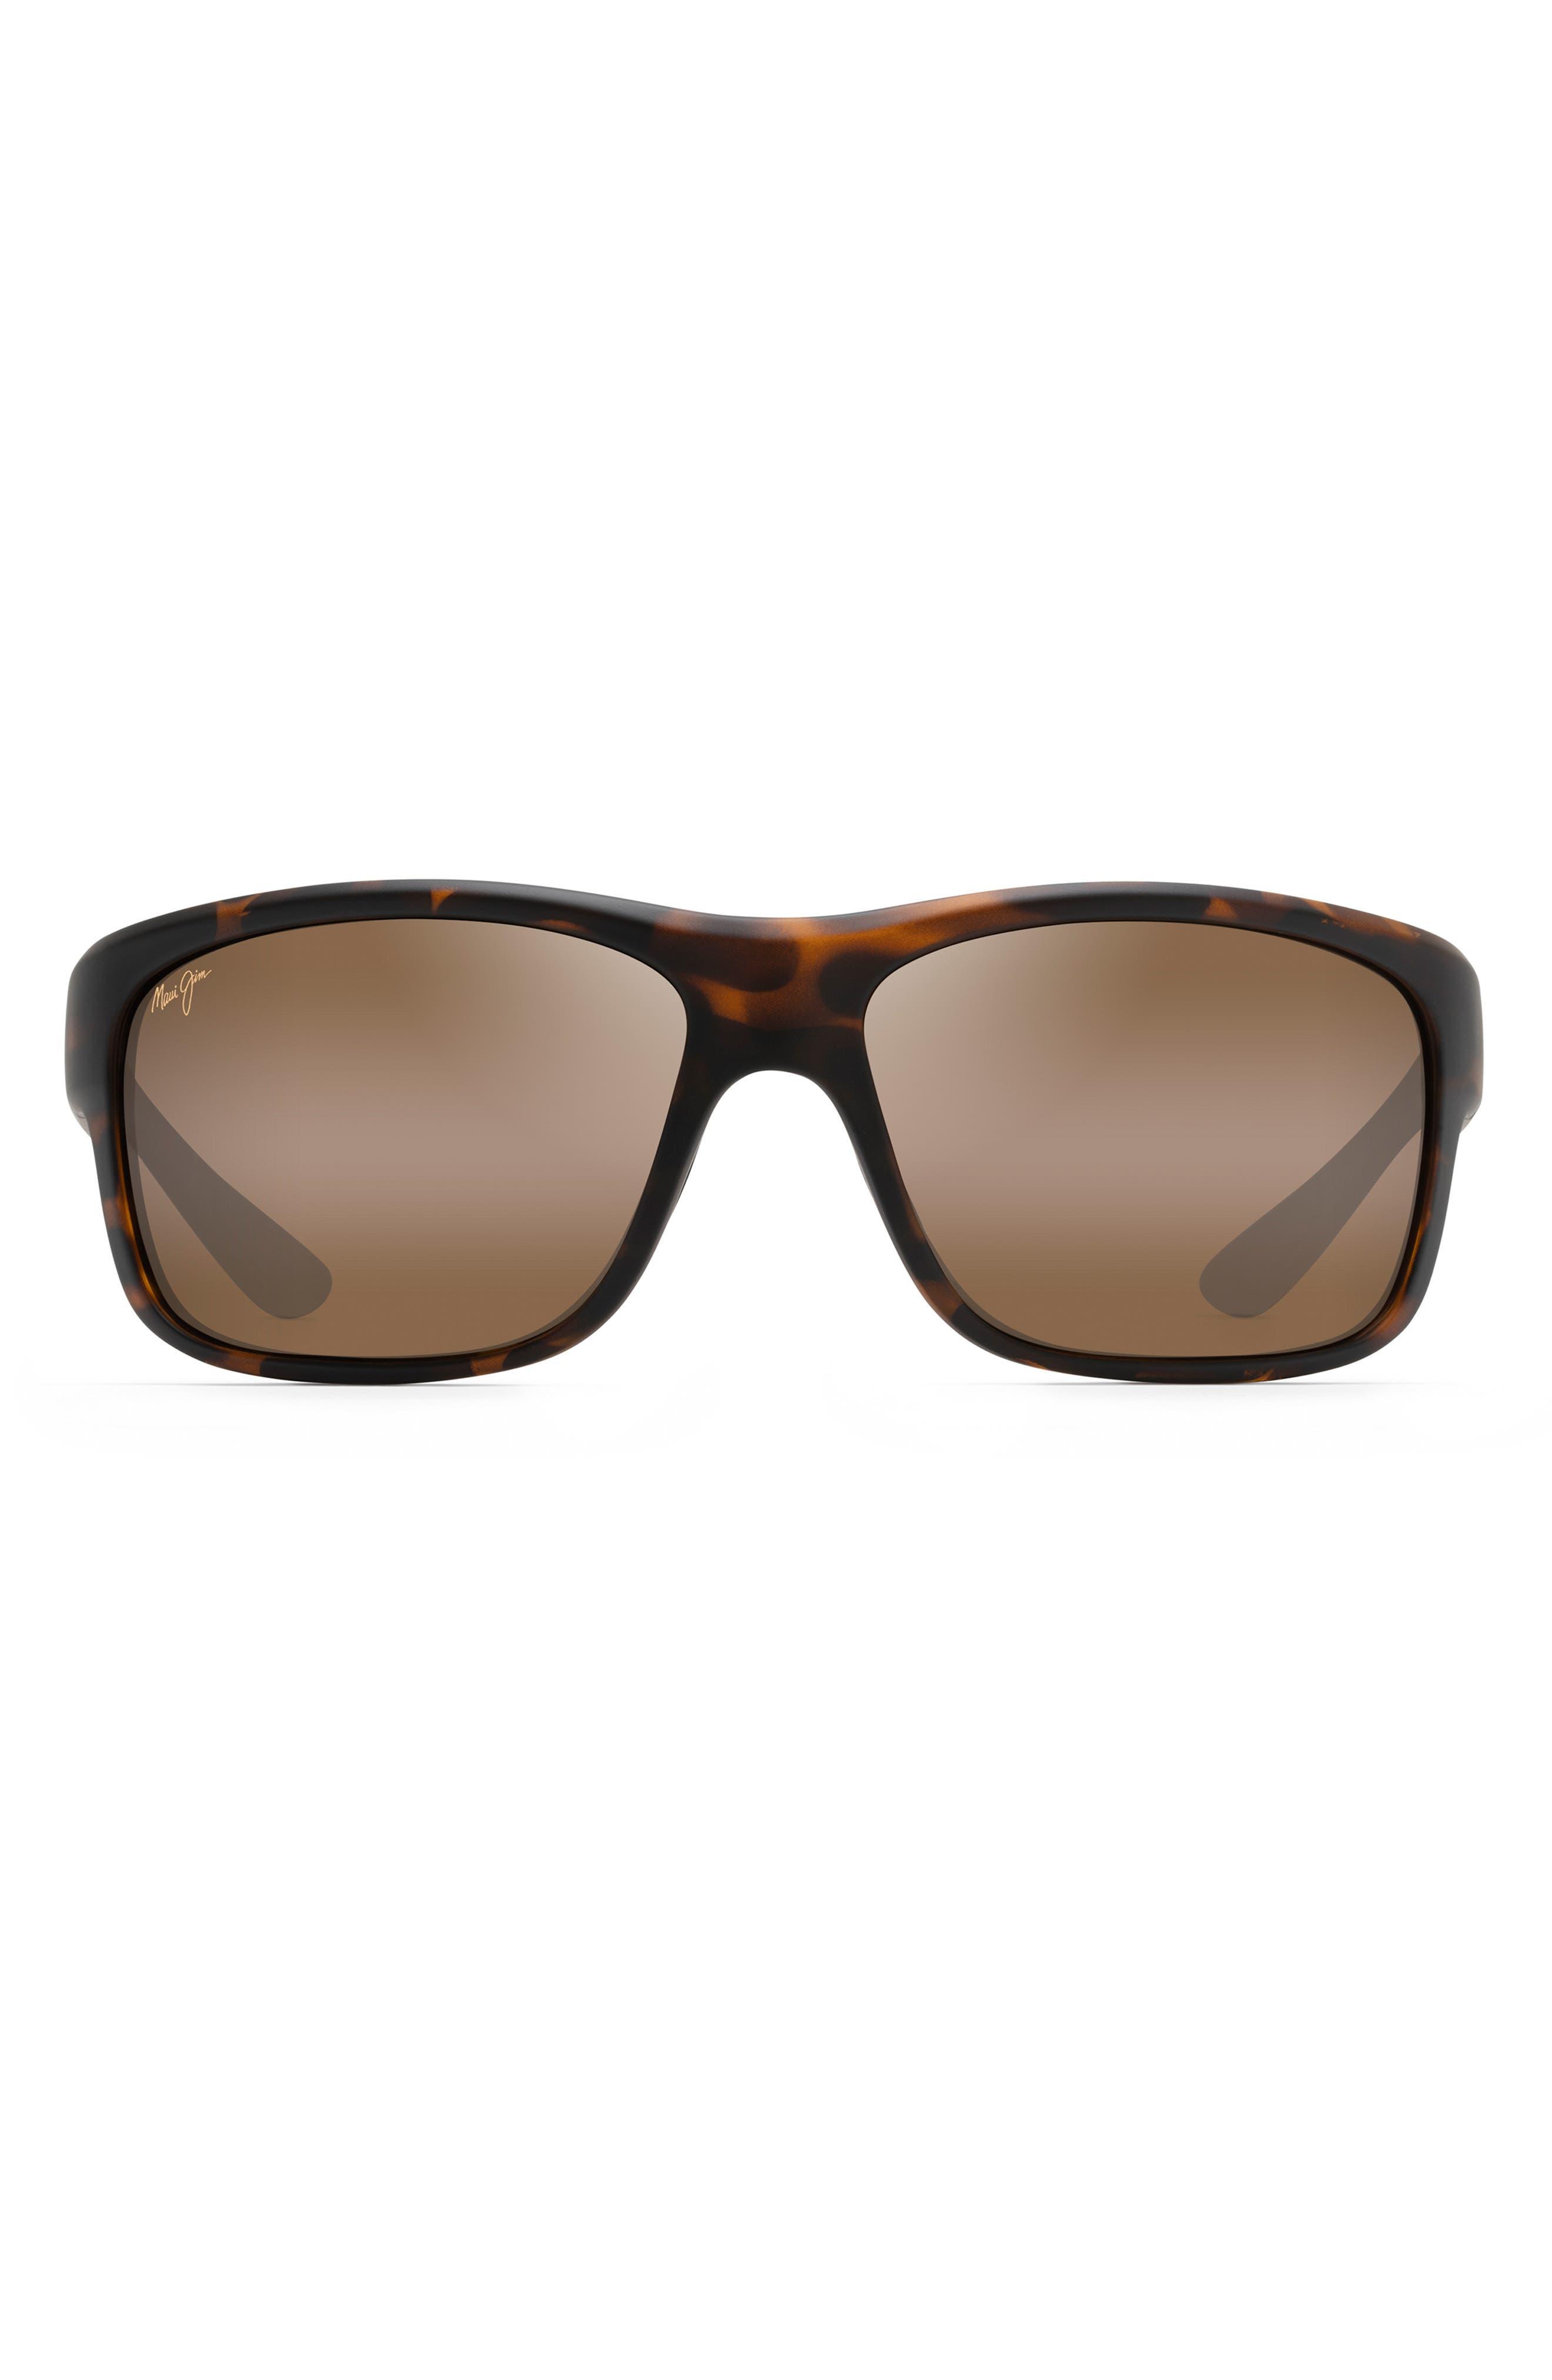 Southern Cross Polarizedplus2 63mm Wraparound Sunglasses